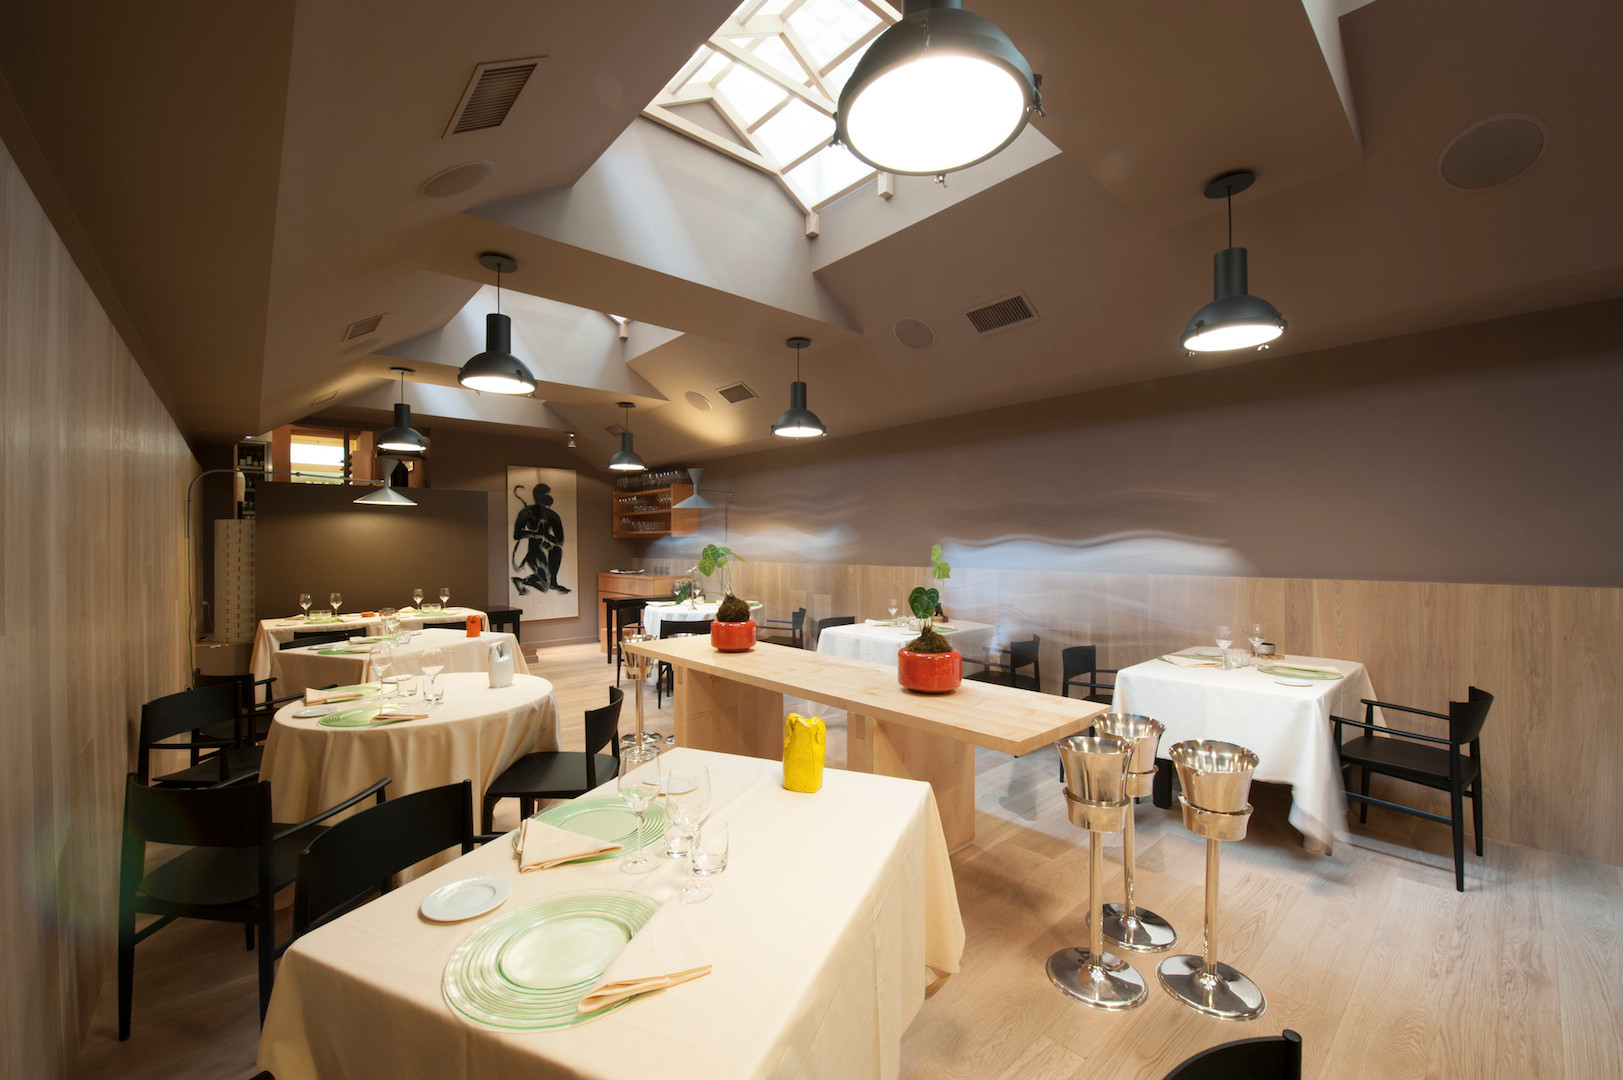 ristoranti vegetariani e vegani - Joia Pietro Leeman - Ristorante Milano